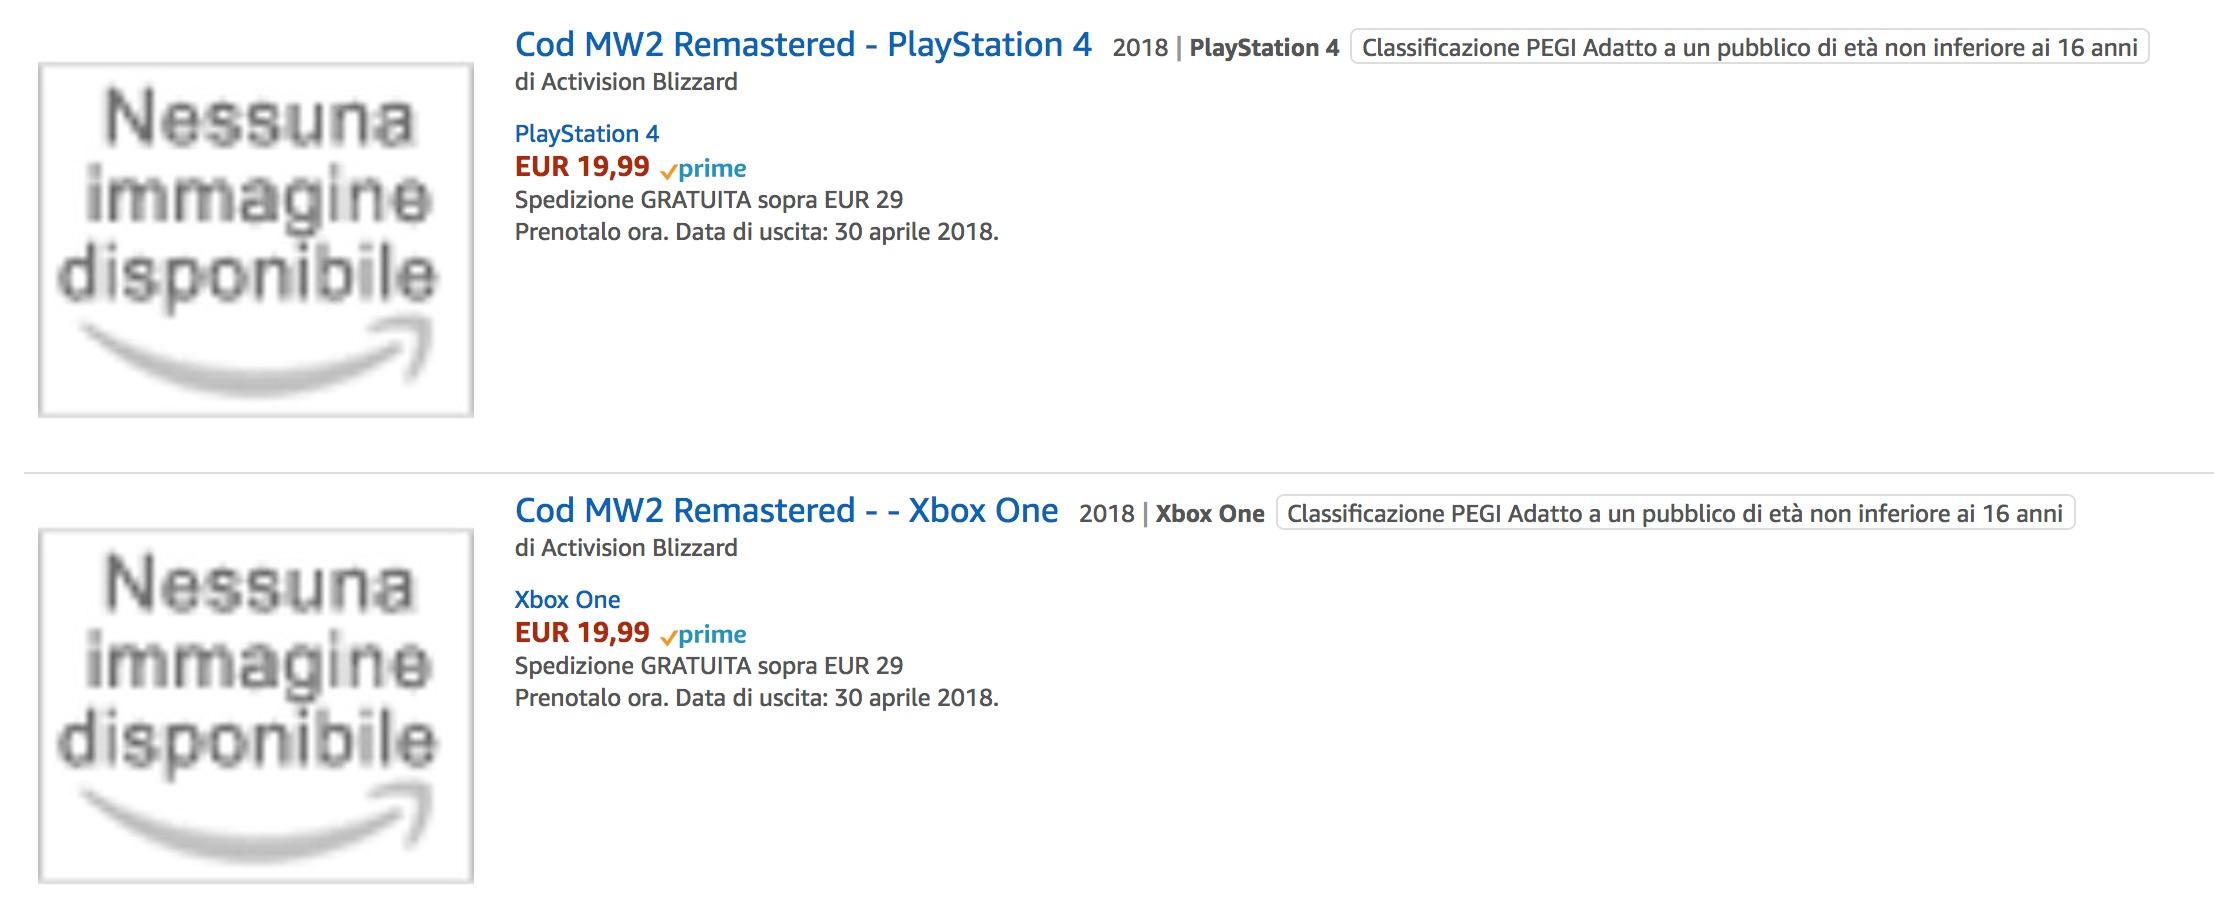 Call of Duty: Modern Warfare 2 Remastered - Amazon